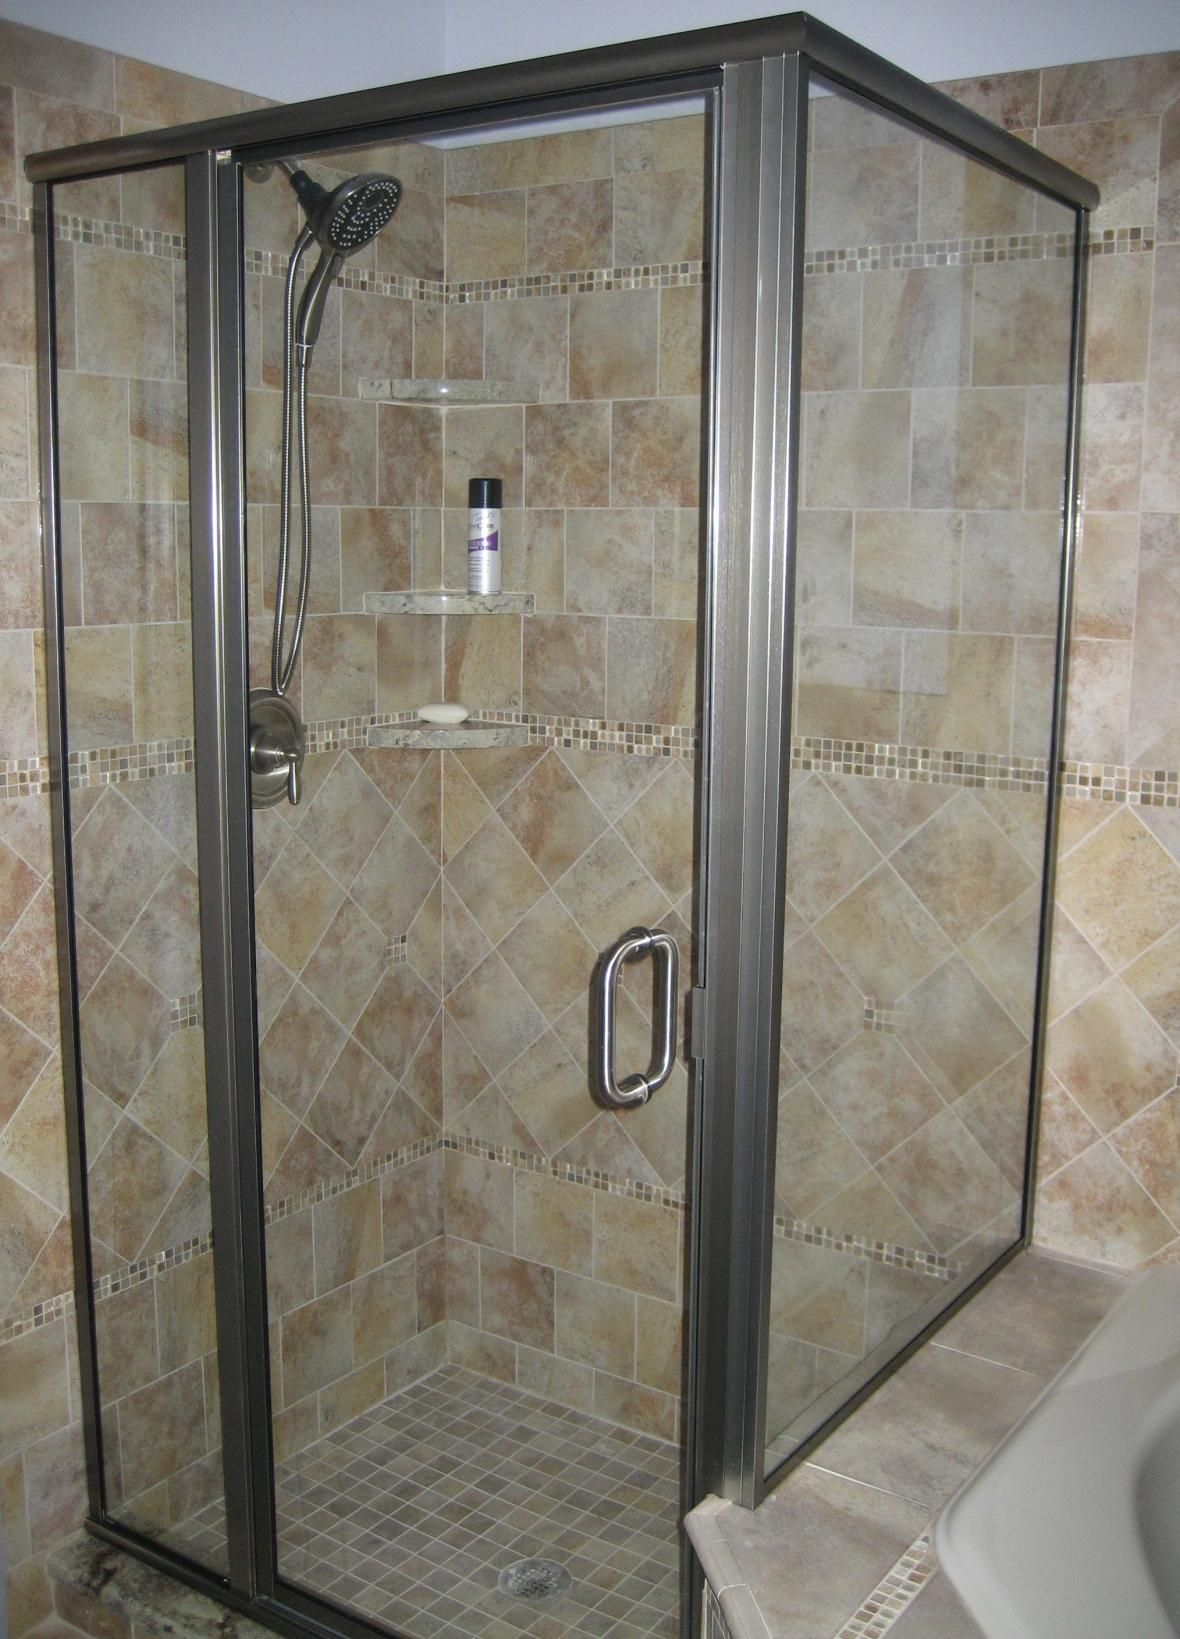 Porcelain Bathroom Showers Designs Walk In Diagonal Tile Pattern